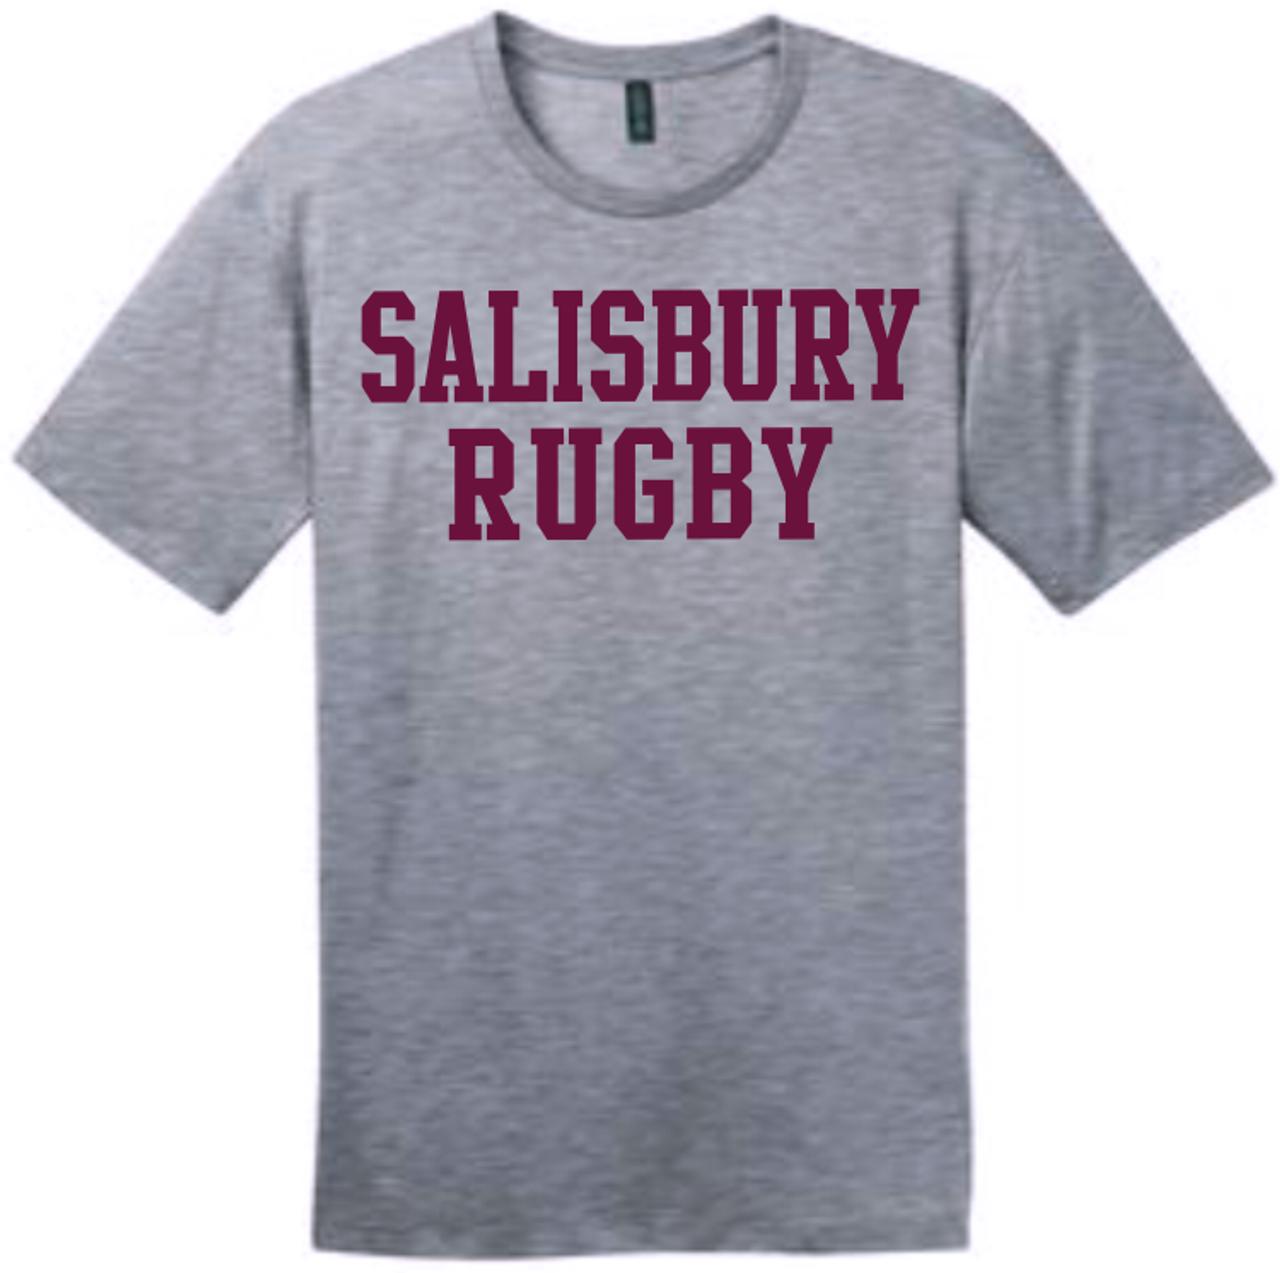 Salisbury Rugby Cotton Tee, Gray